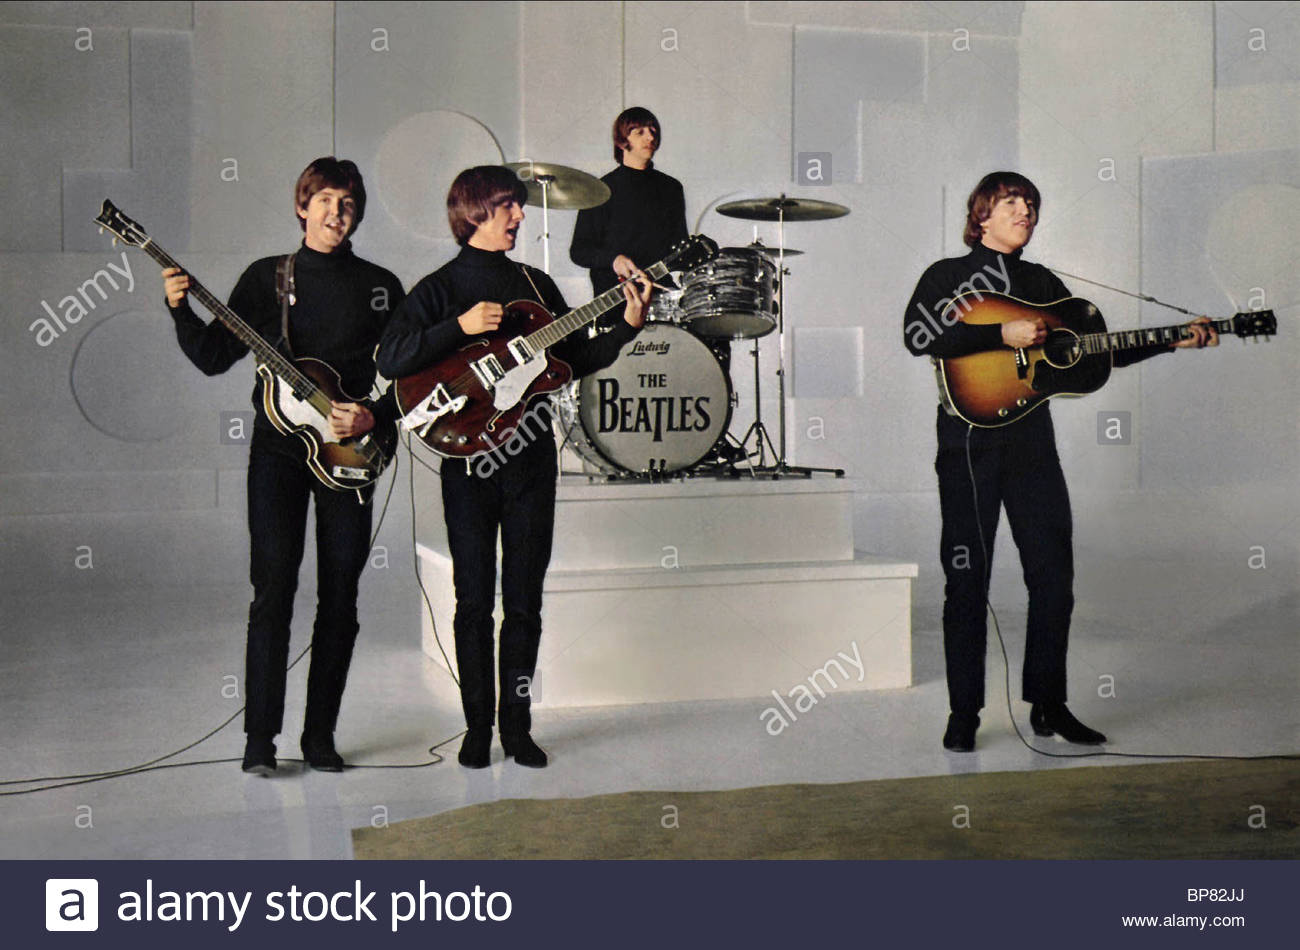 PAUL MCCARTNEY, GEORGE HARRISON, RINGO STARR, JOHN LENNON, HELP!, 1965 - Stock Image